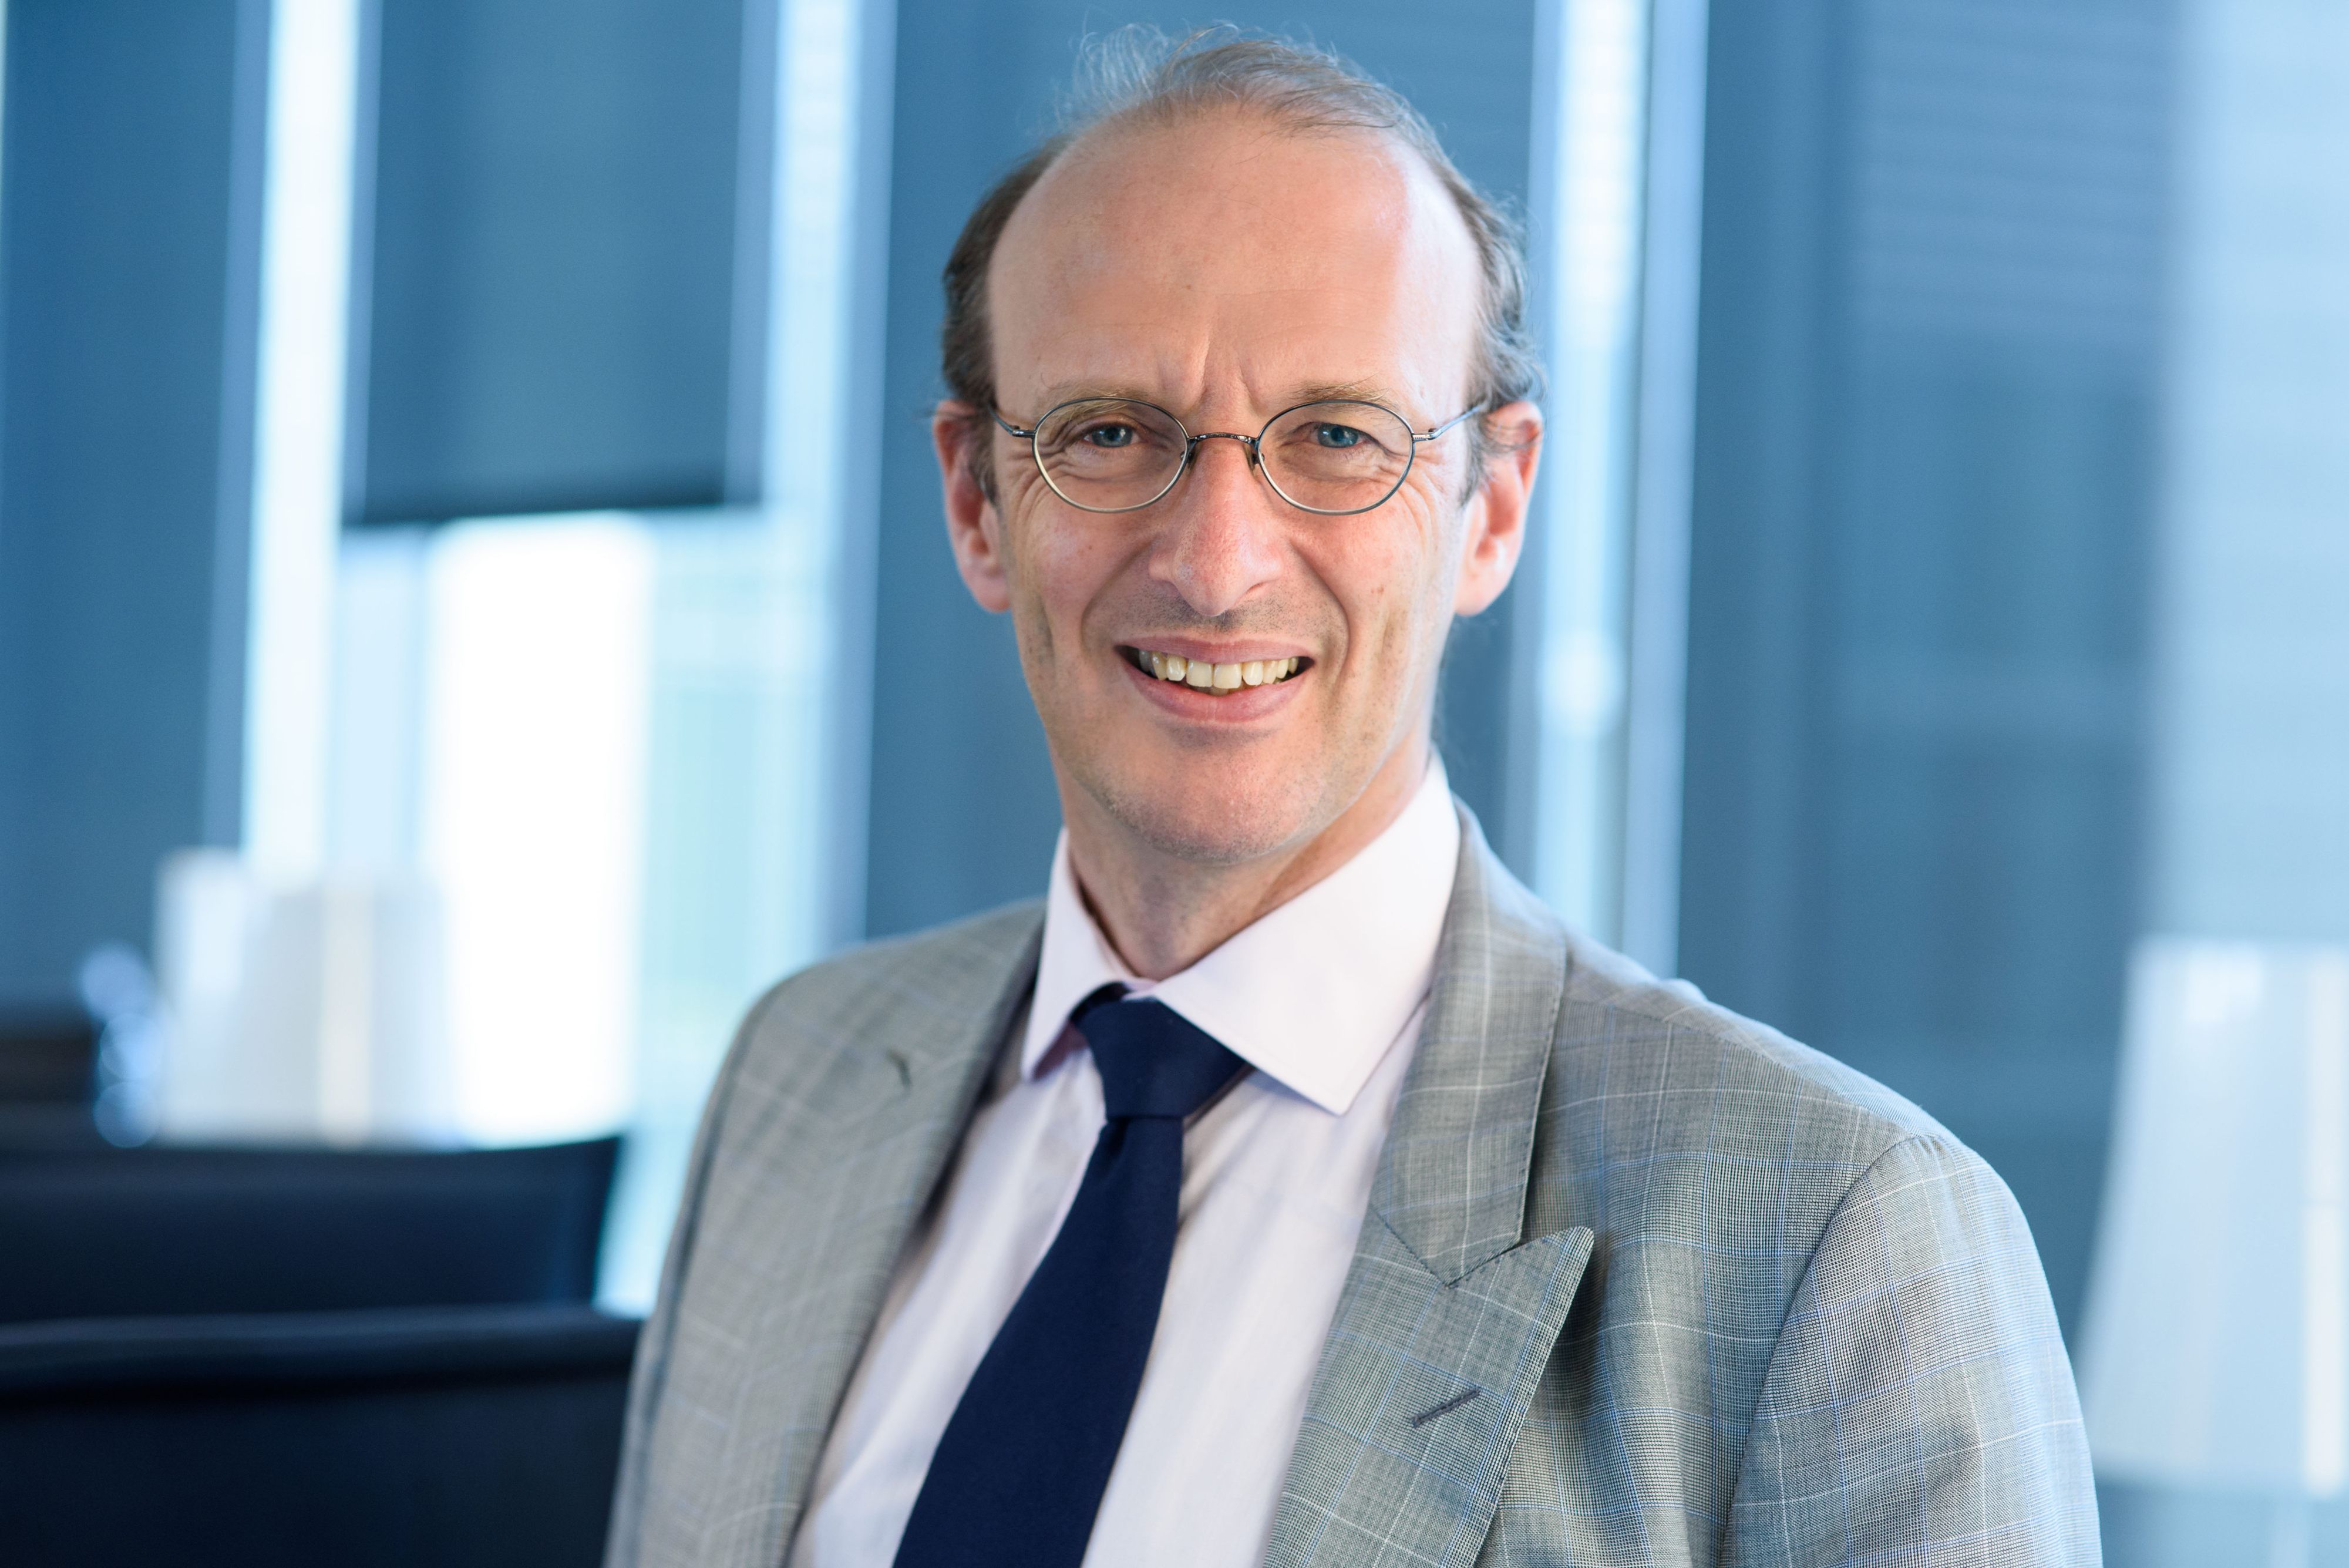 Hugues Sévérac est directeur de l'innovation d'Aviva France depuis février 2015. © Aviva France